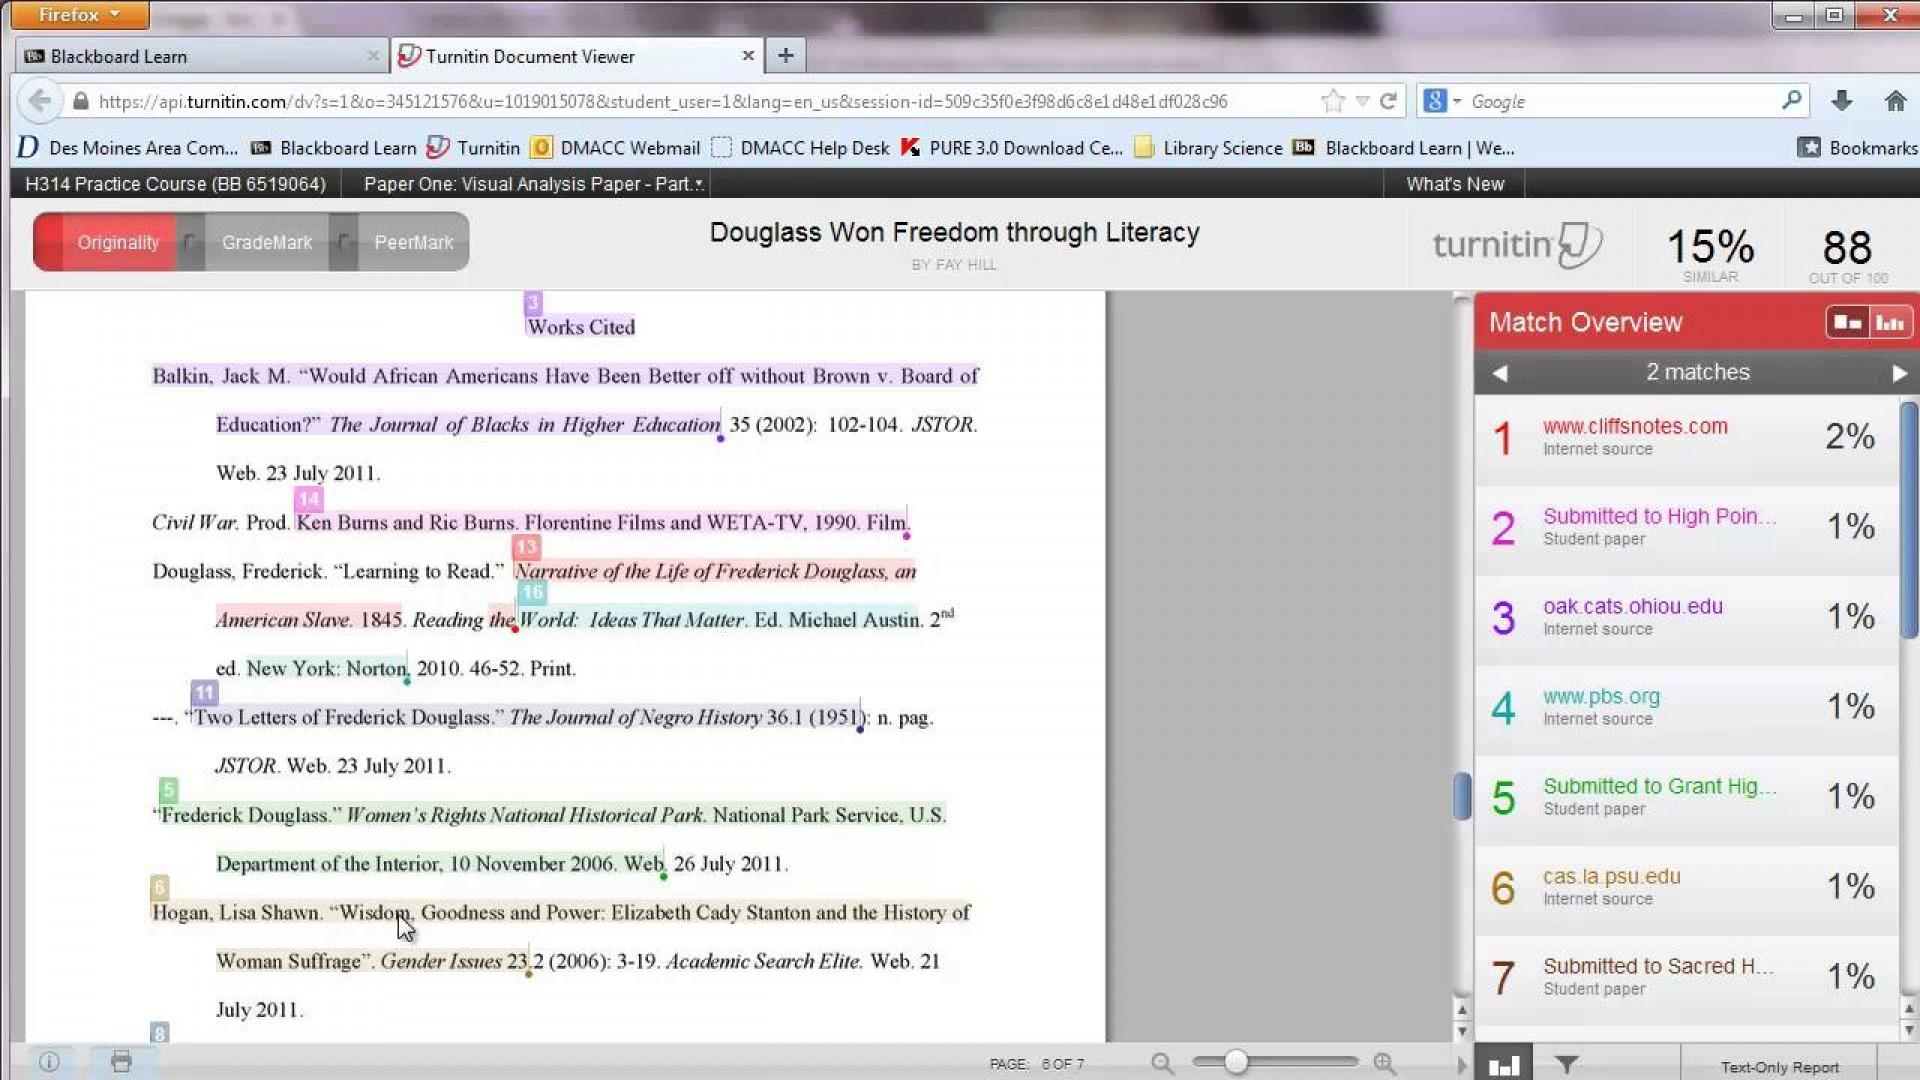 006 Essay Plagiarism Checker Maxresdefault Unforgettable Ieee Paper Online Uk 1920